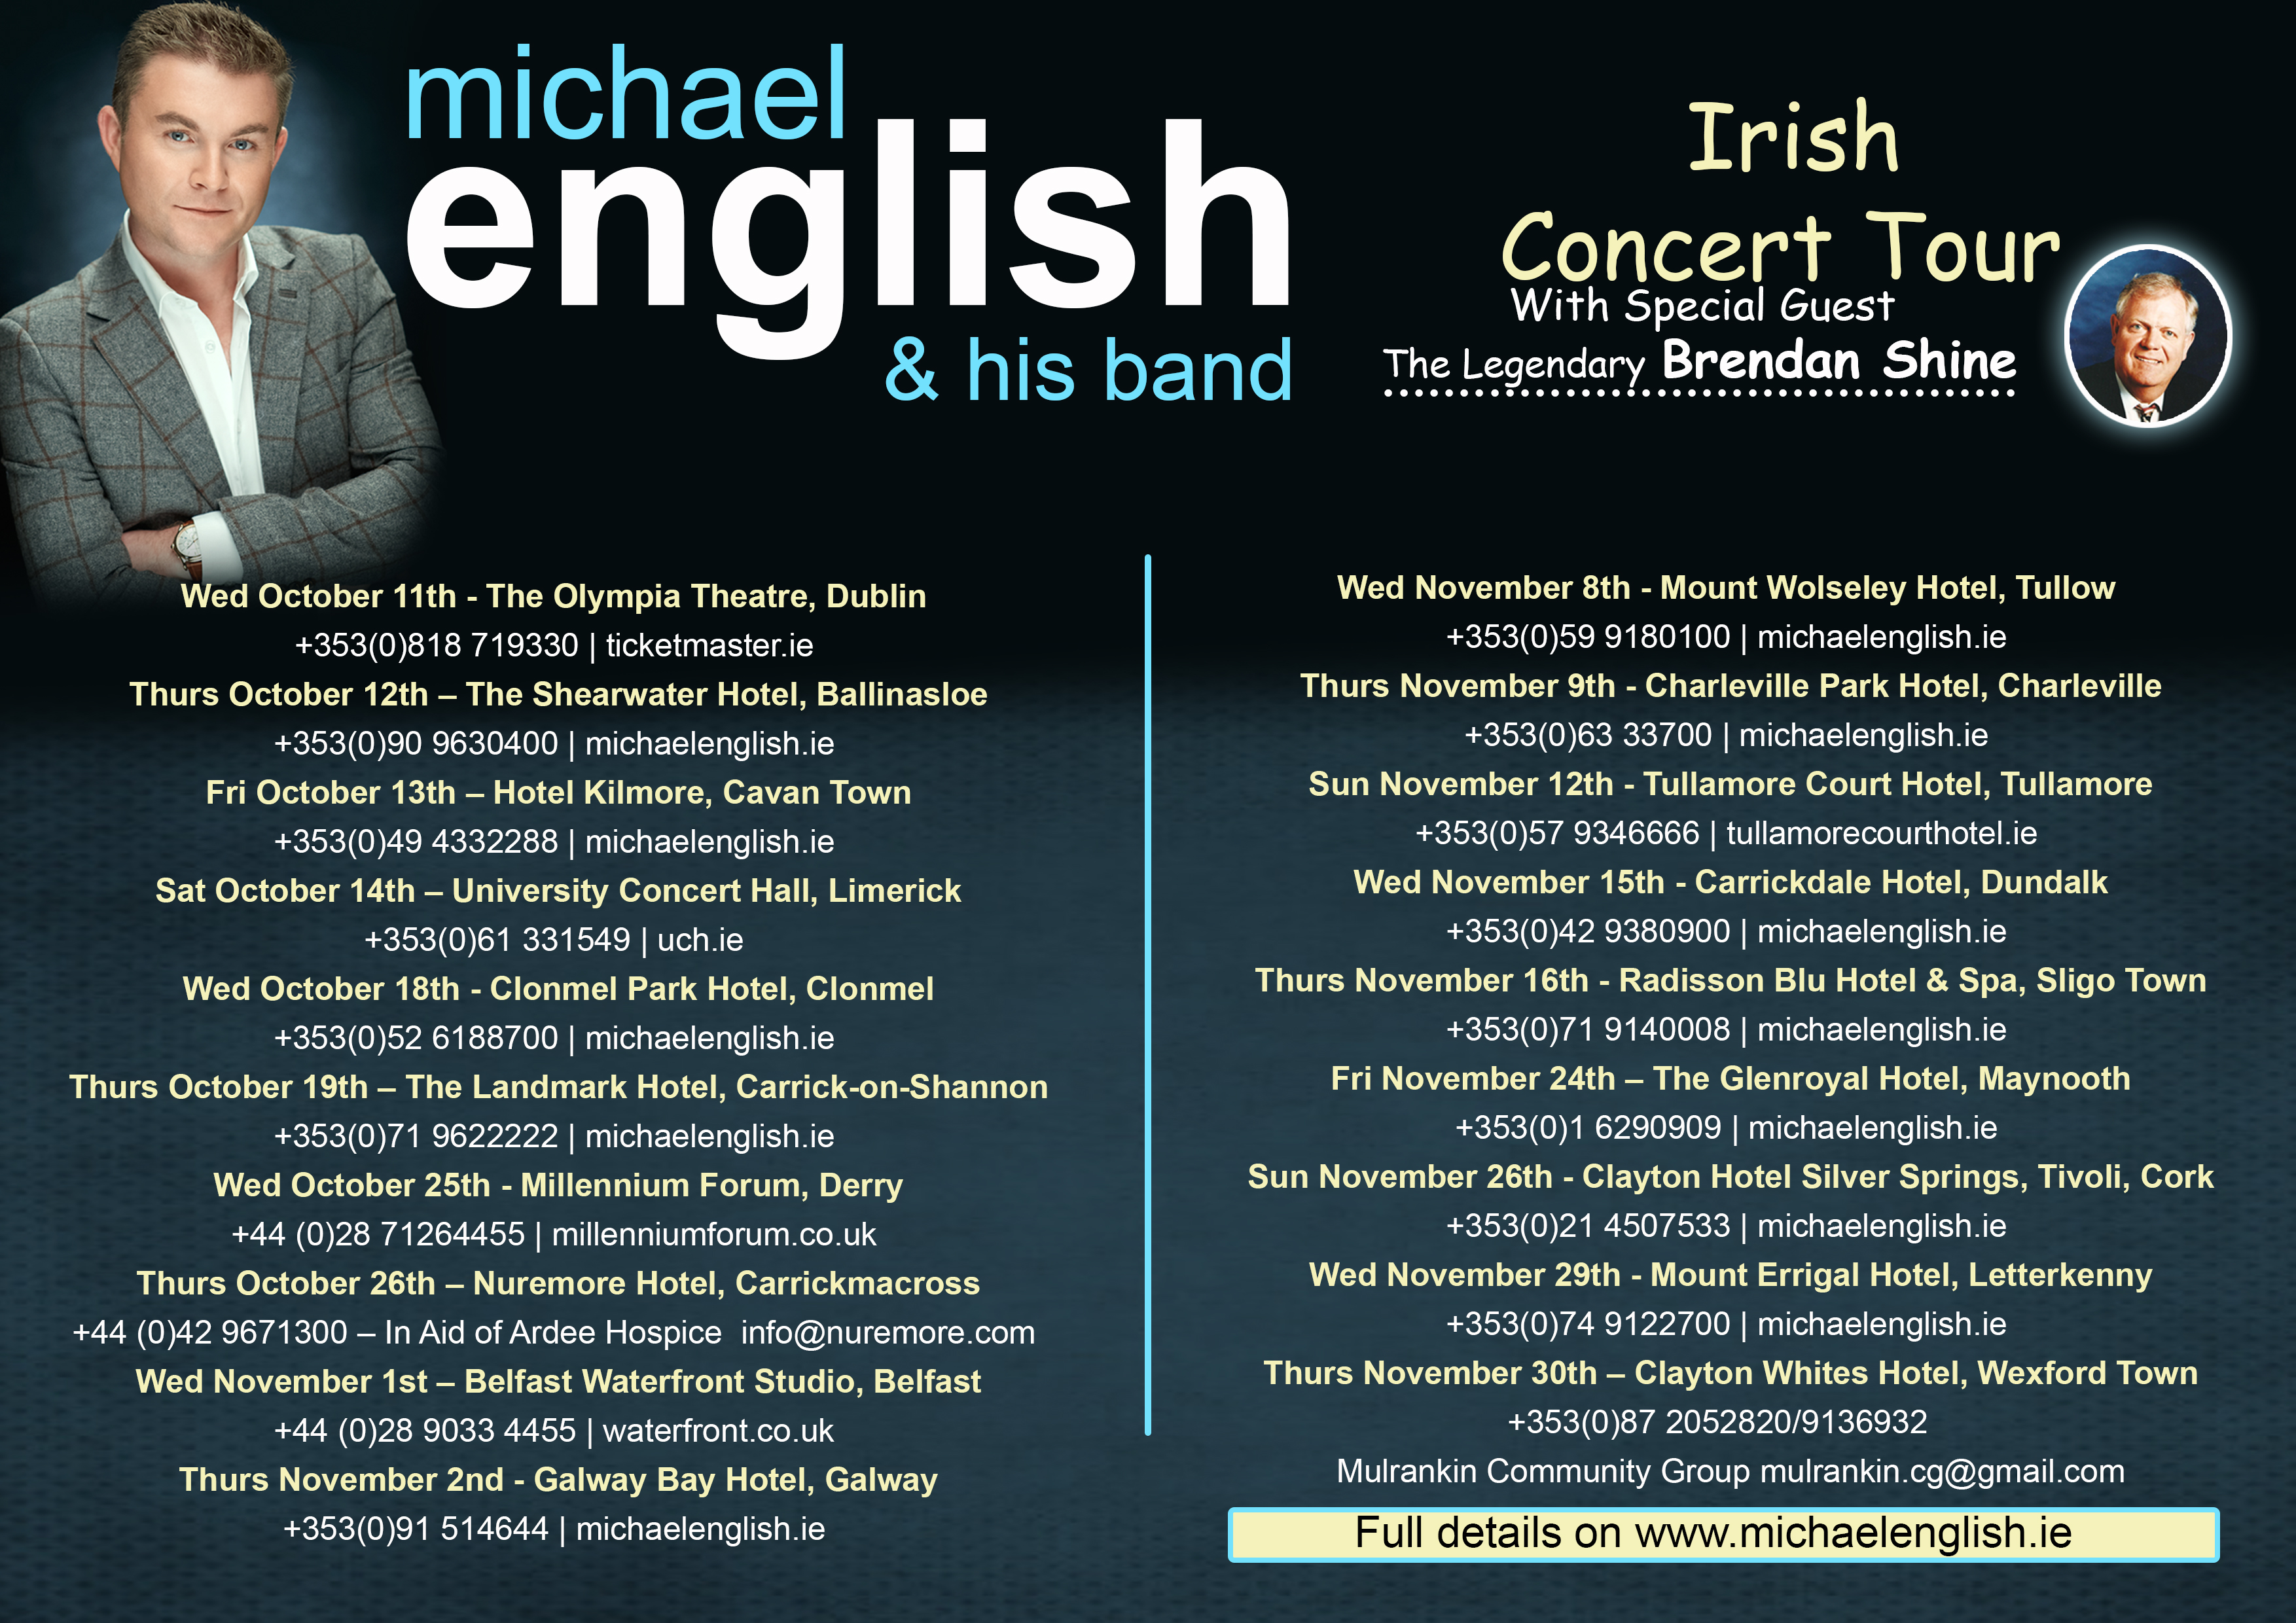 michael english – irish concert tour oct/nov 2017 michael english